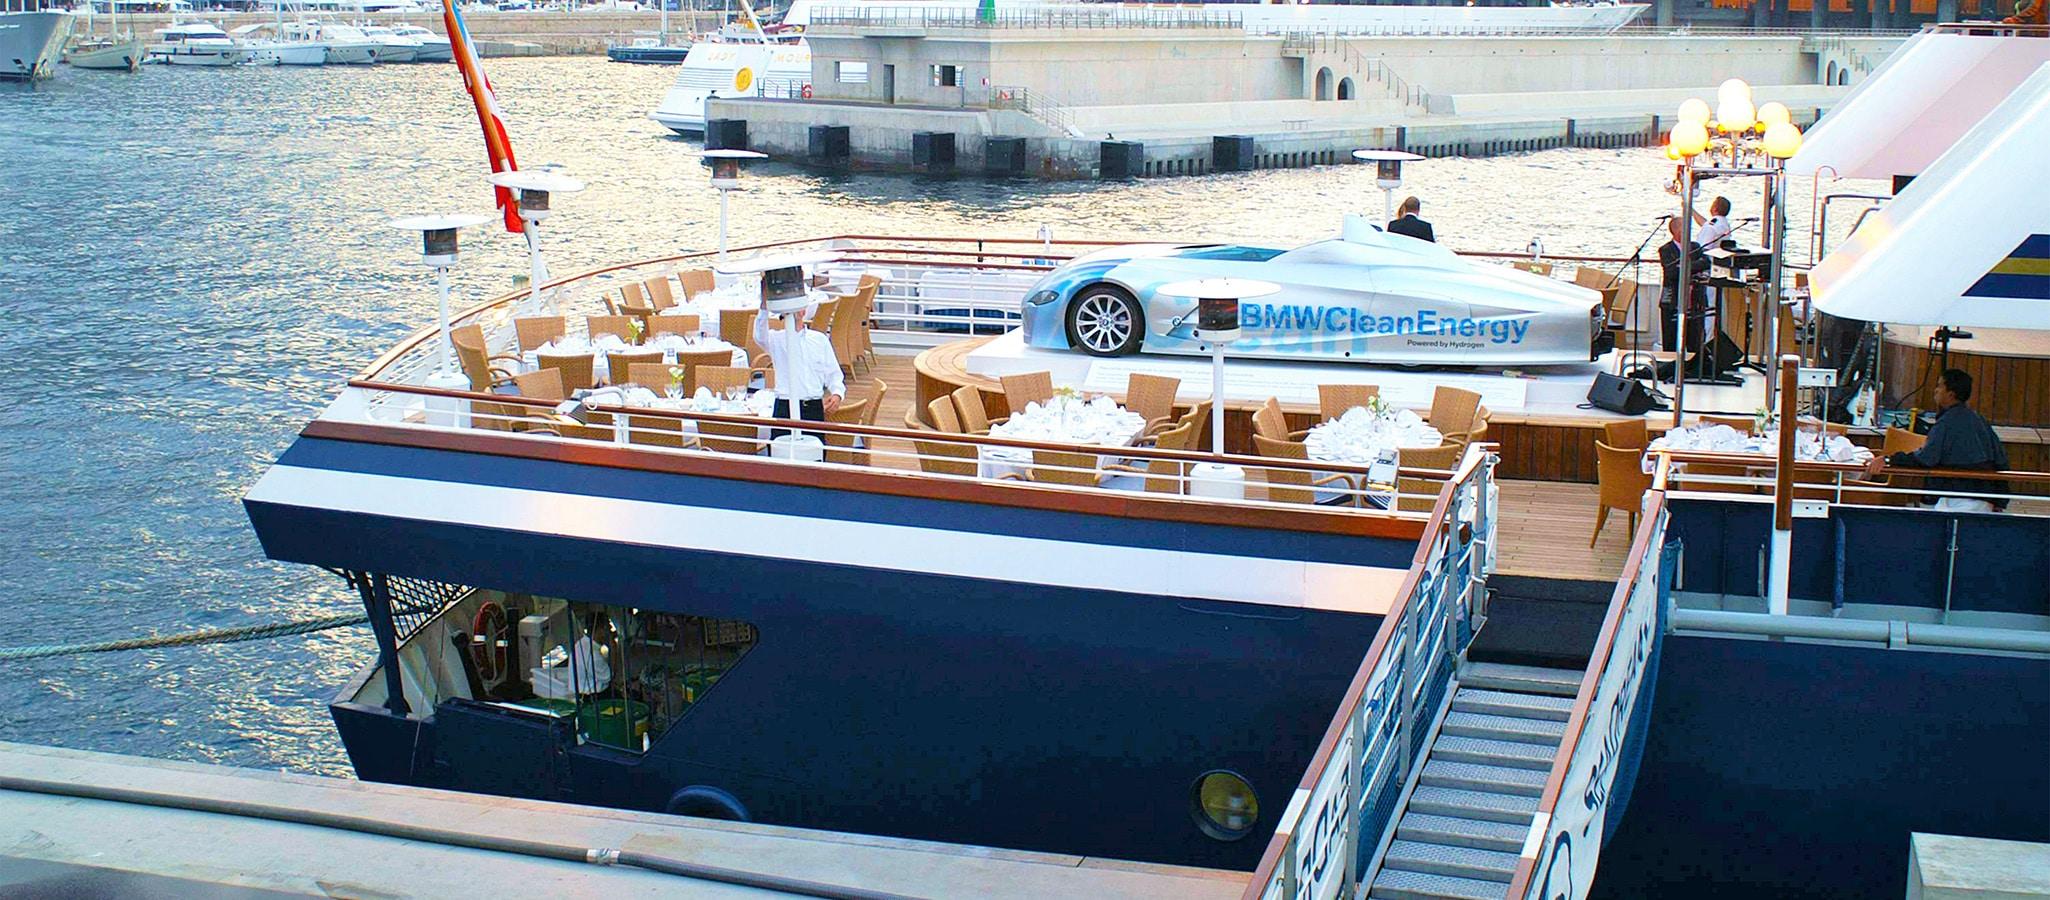 Das Pooldeck verwandelt OceanEvent bei Bedarf in spektakuläre Präsentationsflächen.